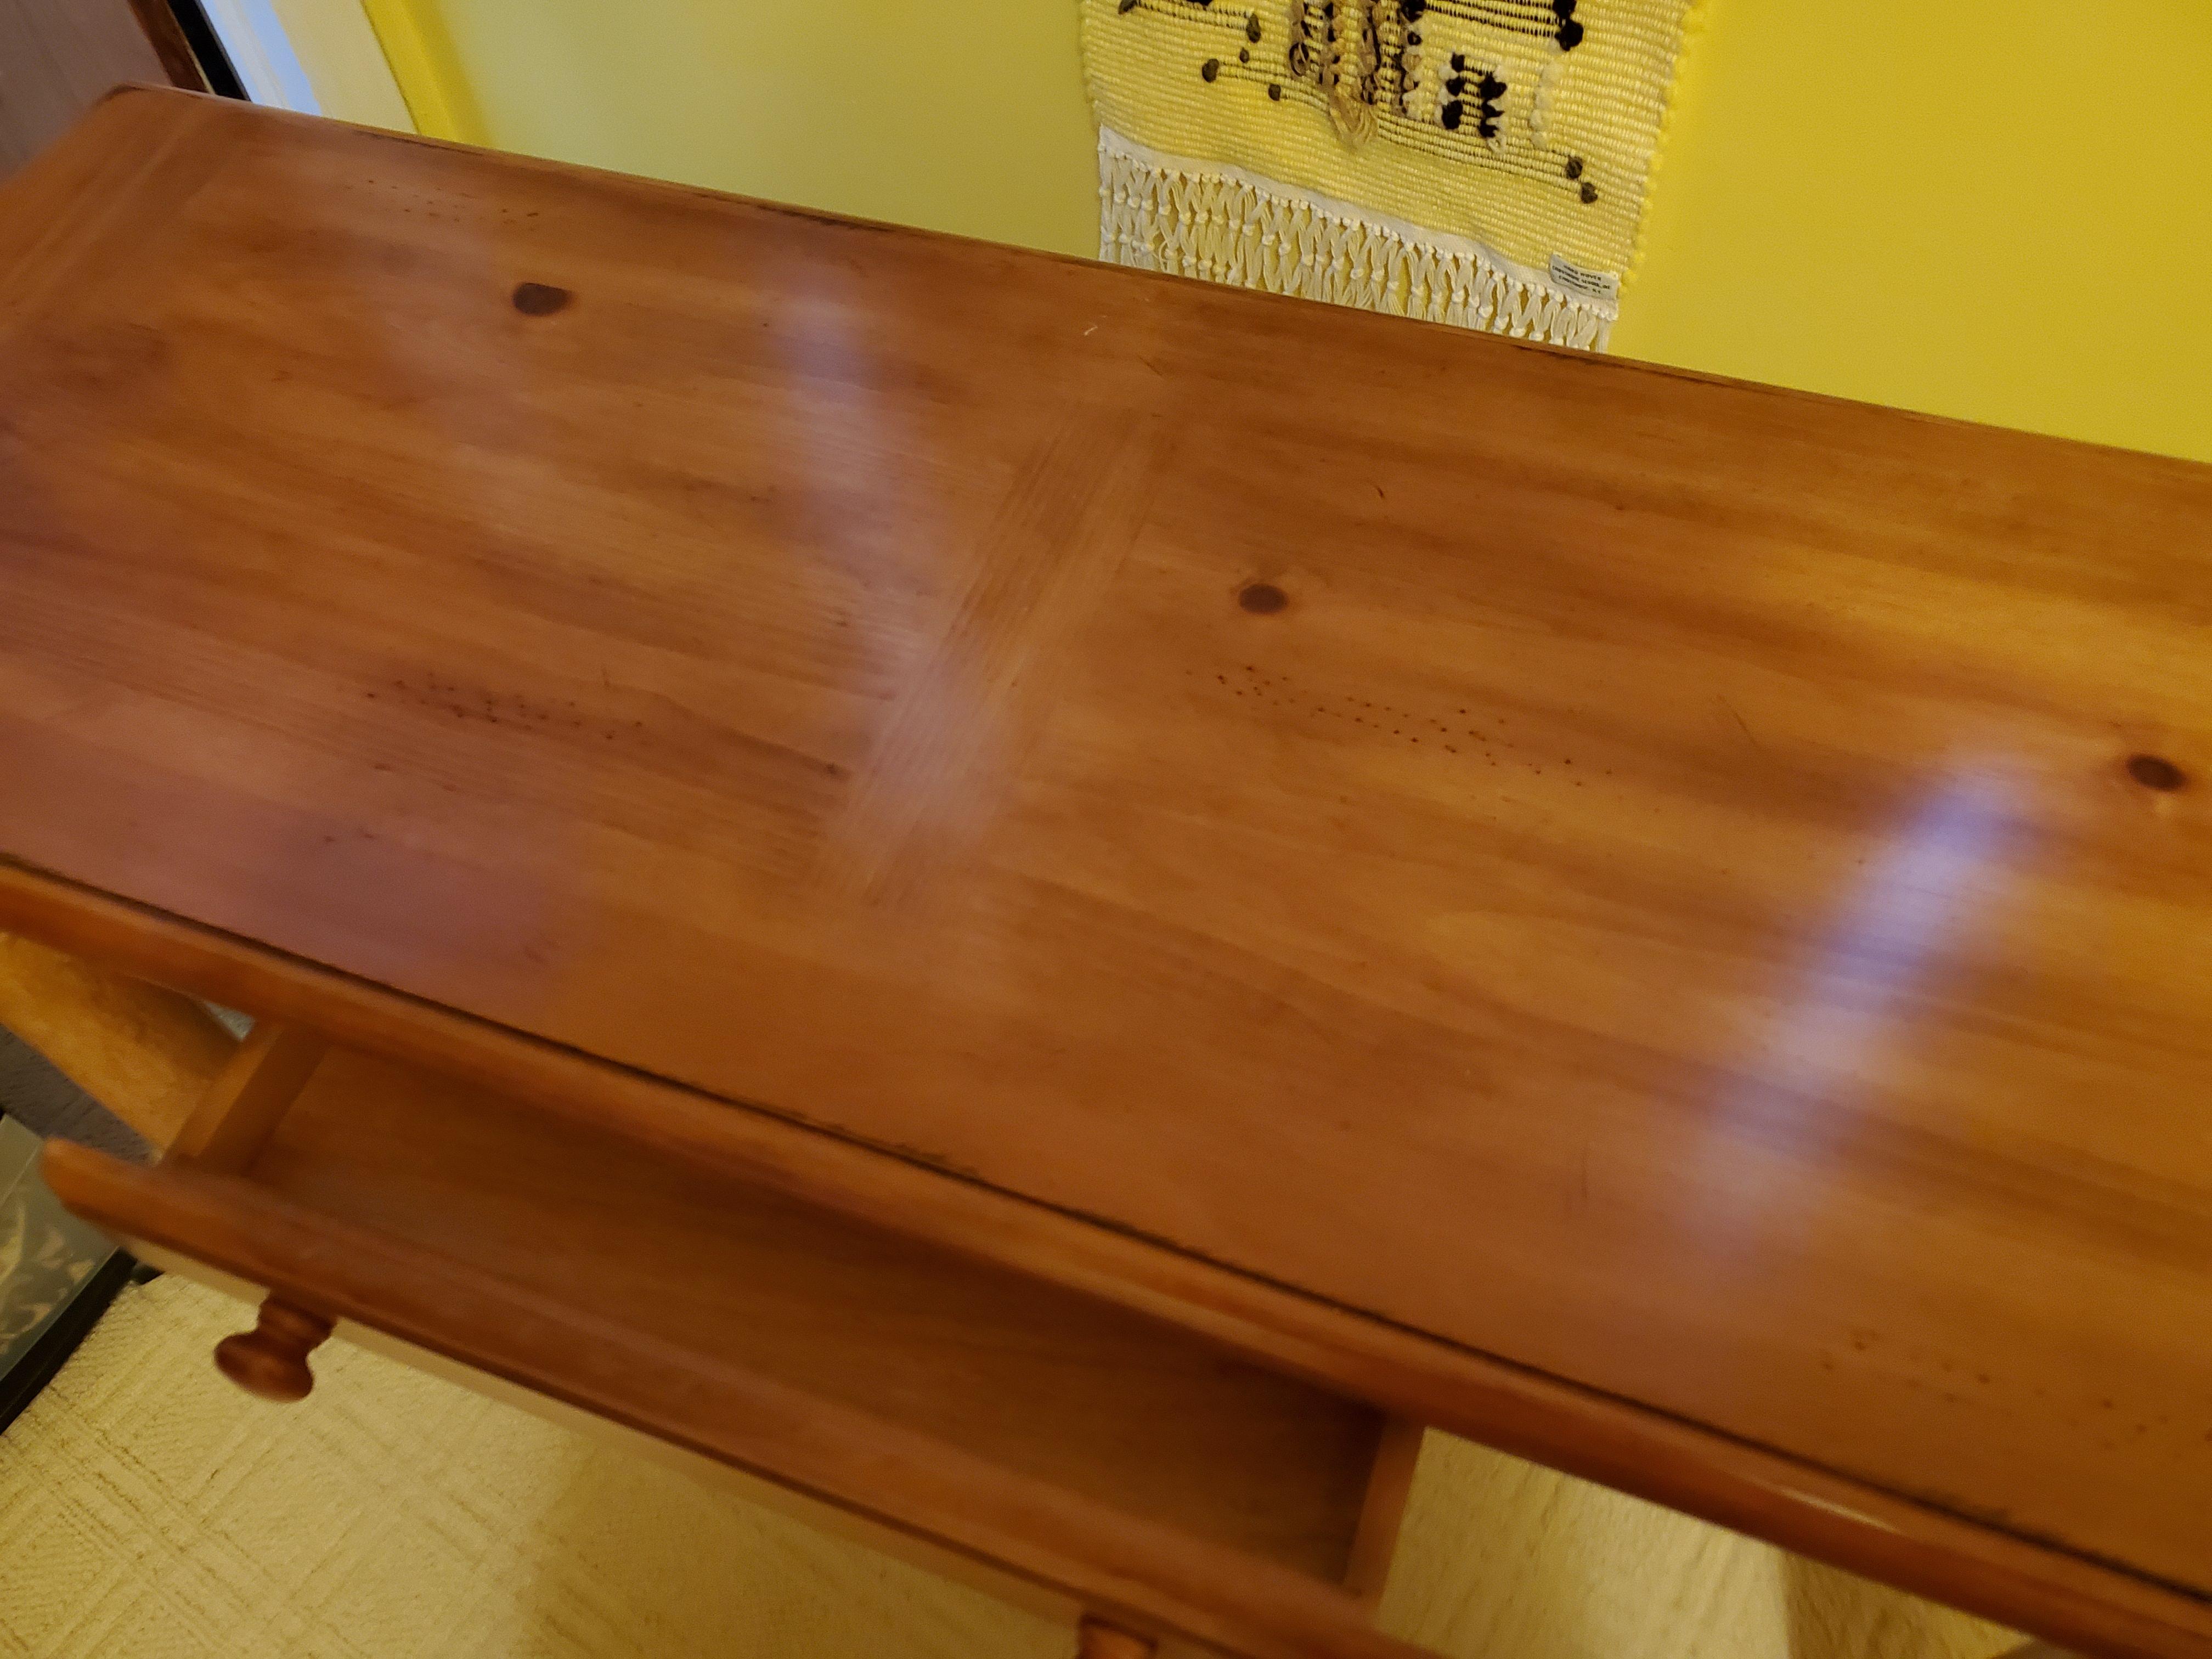 Astonishing Sofa Table Inside Unc Charlotte Unc Charlotte Ibusinesslaw Wood Chair Design Ideas Ibusinesslaworg